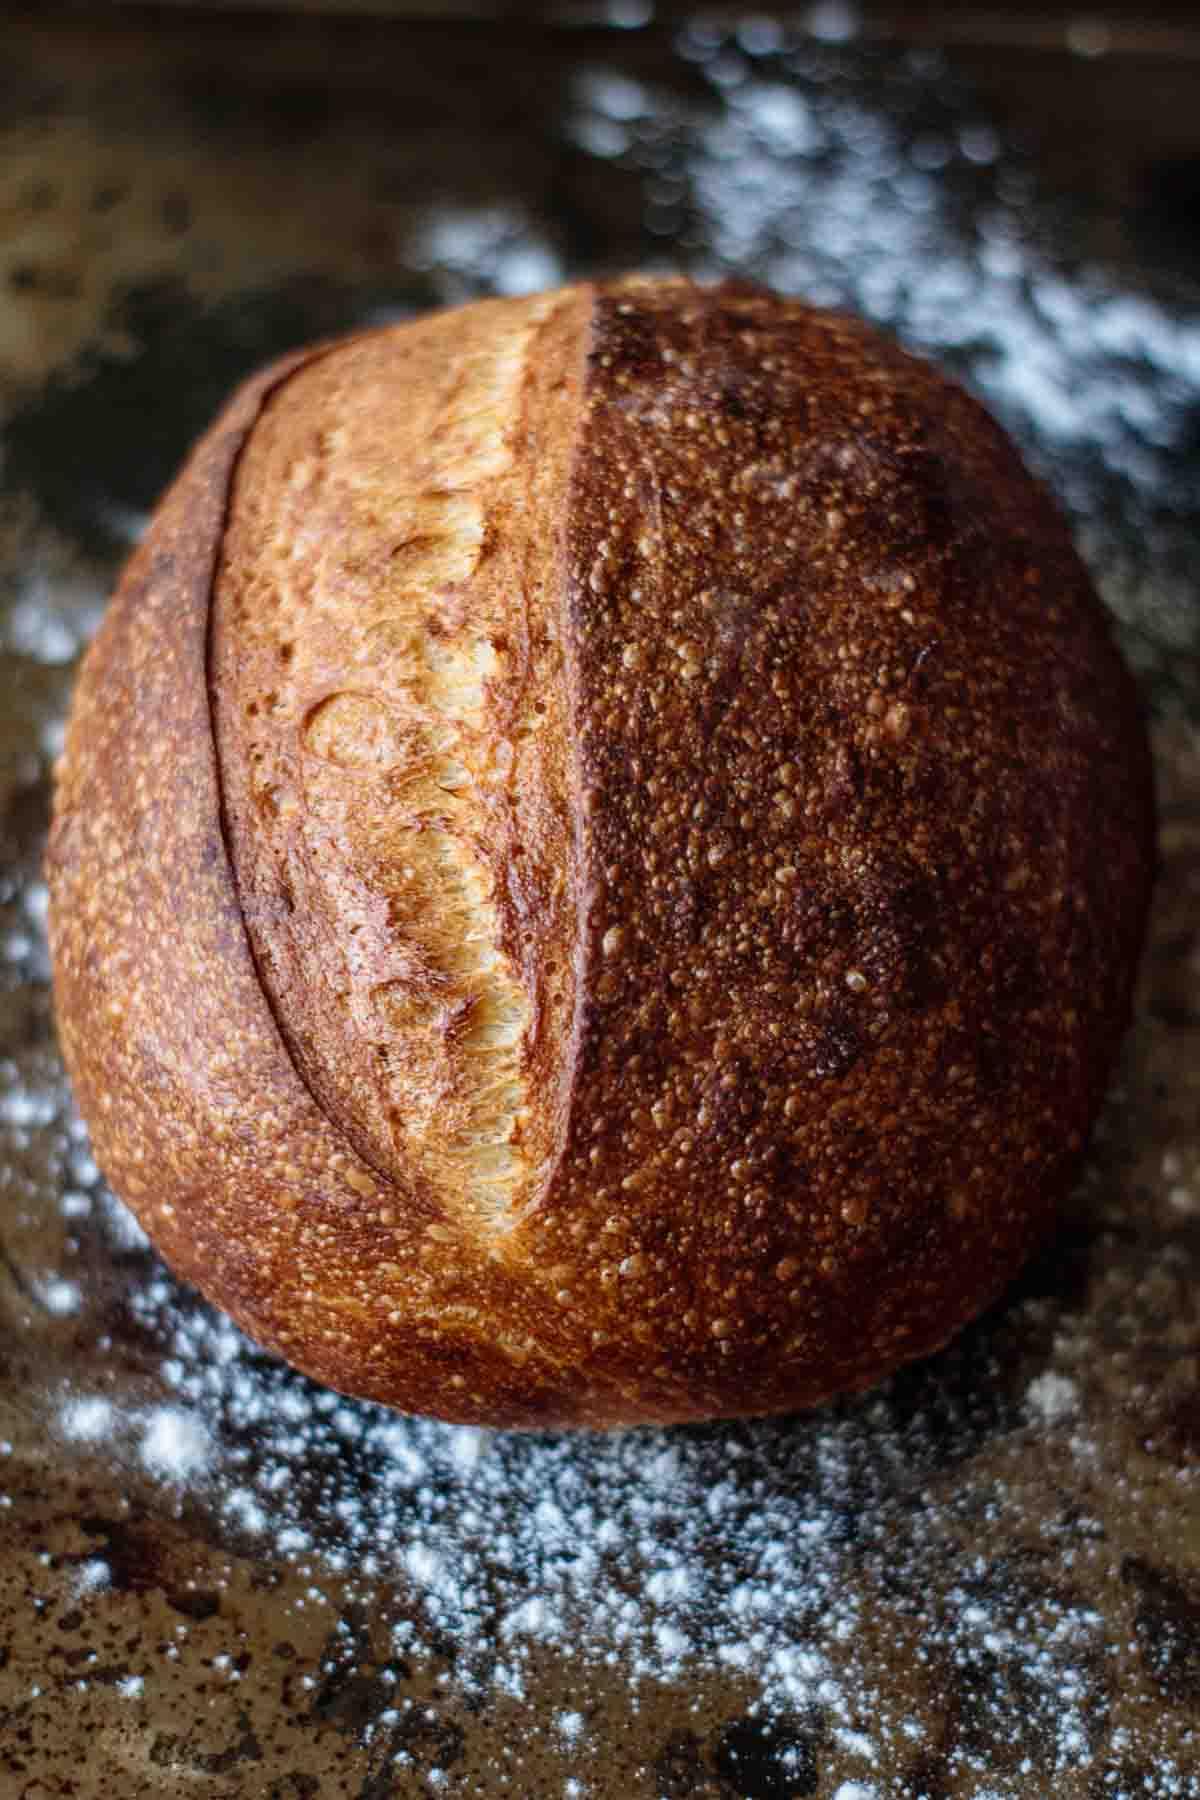 golden sourdough artisan bread baked without a Dutch oven